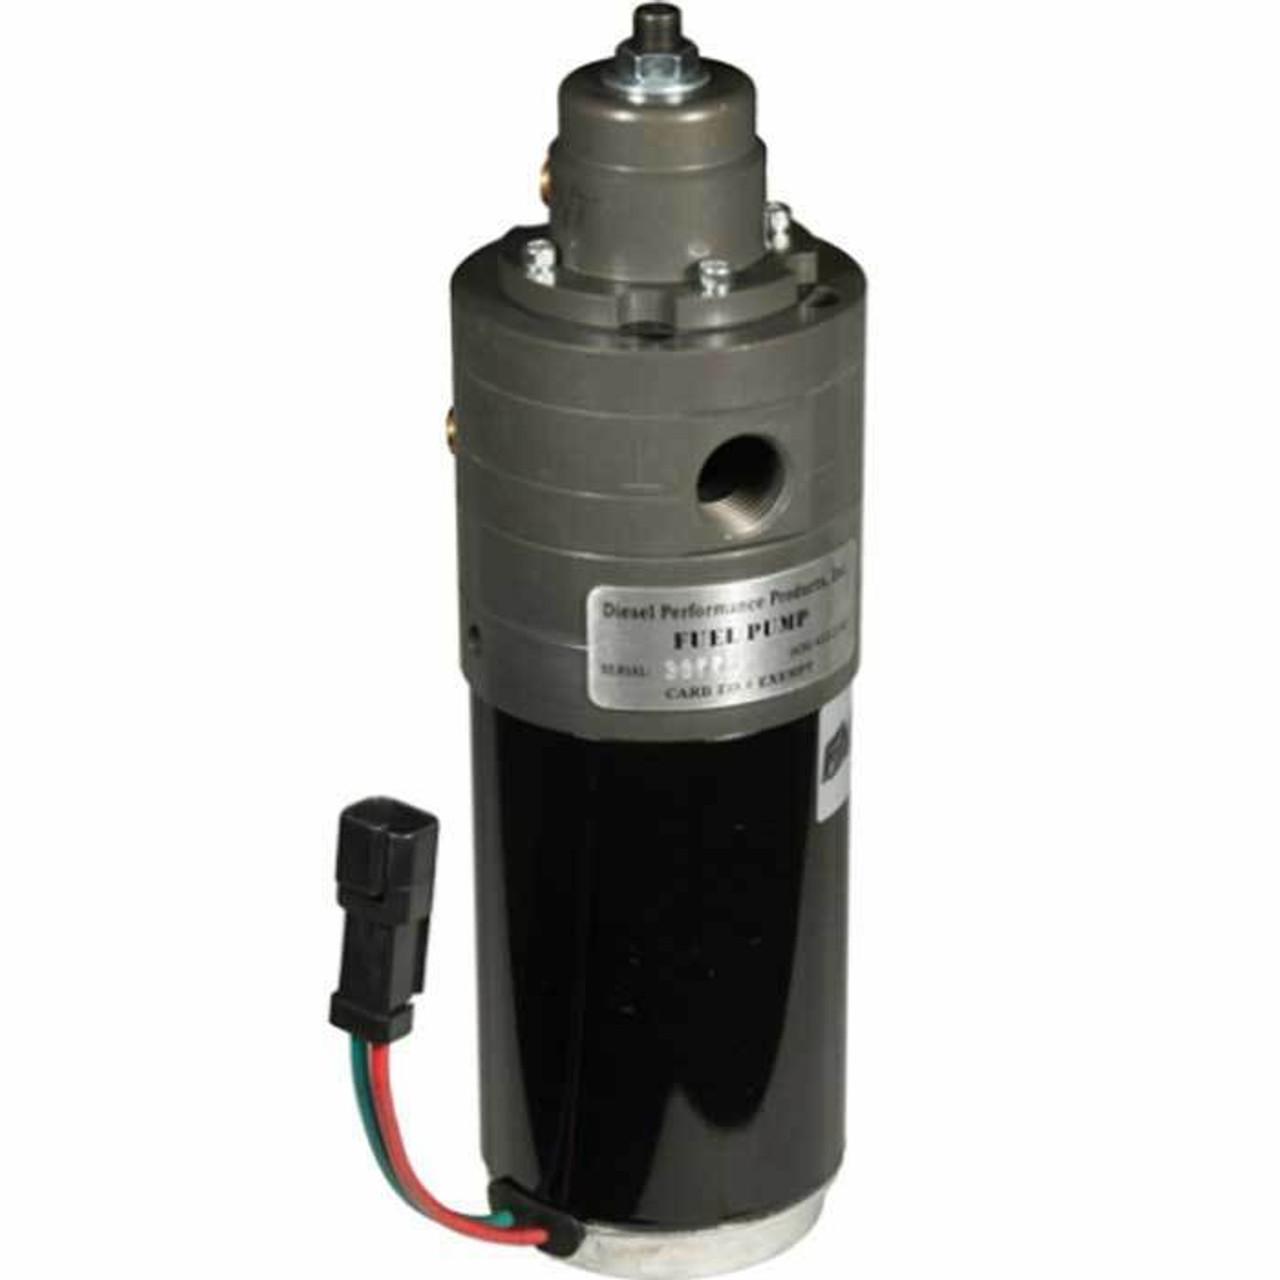 FASS ADJUSTABLE FUEL PUMP 11-16 FORD POWERSTROKE F250/F350 DIESEL 6.7L 140 GPH